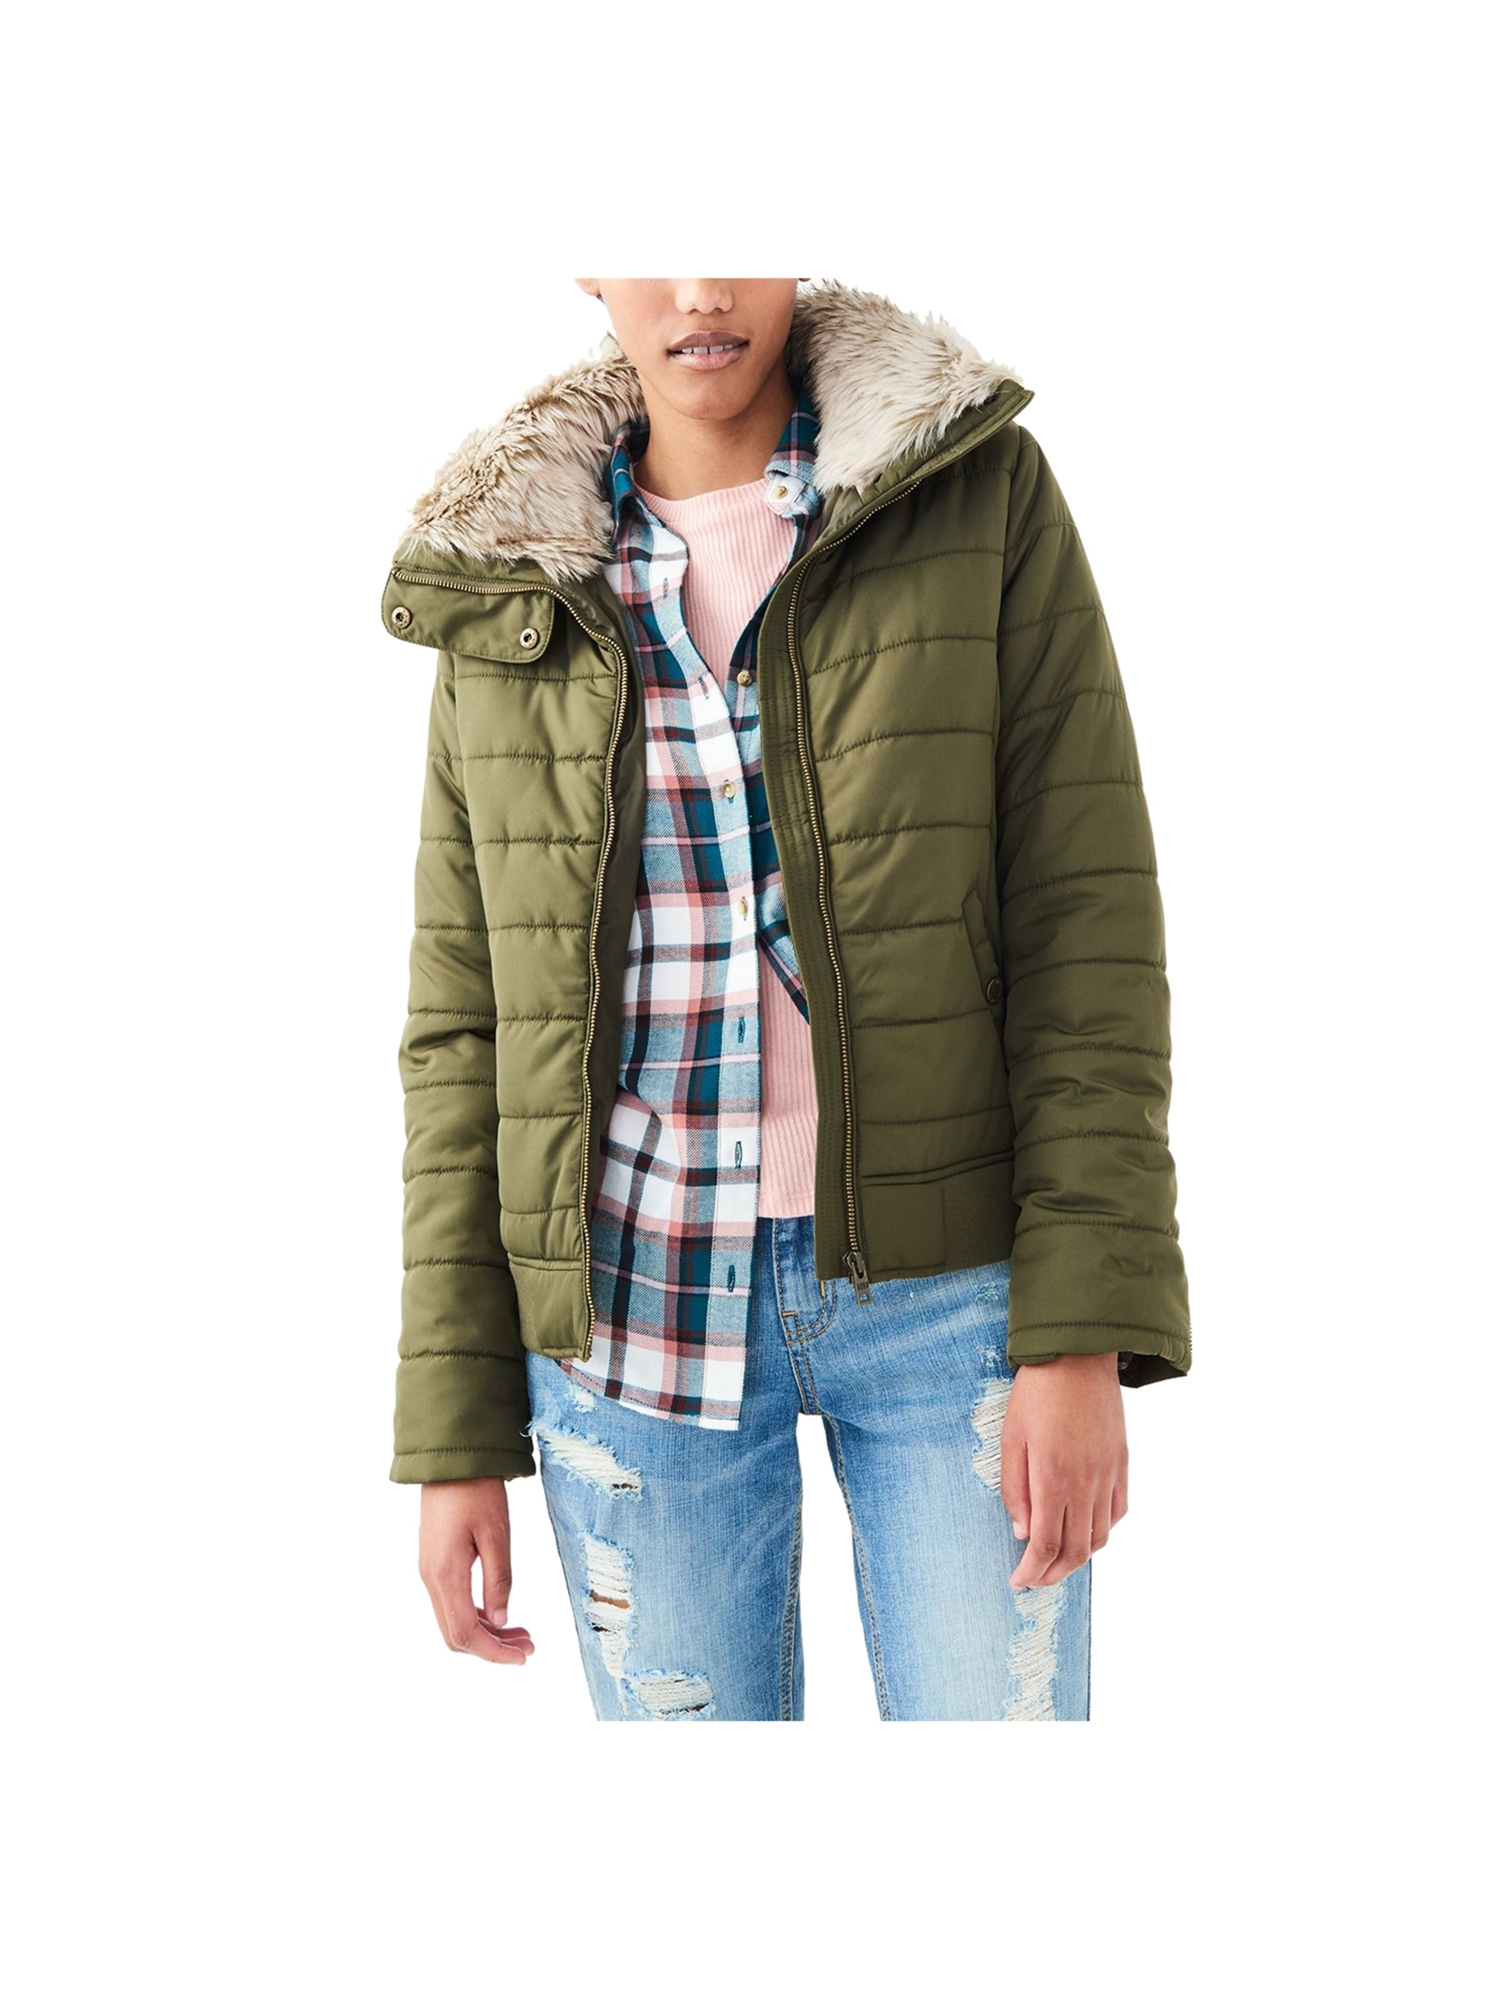 Aeropostale Juniors Full Zip Puffer Jacket